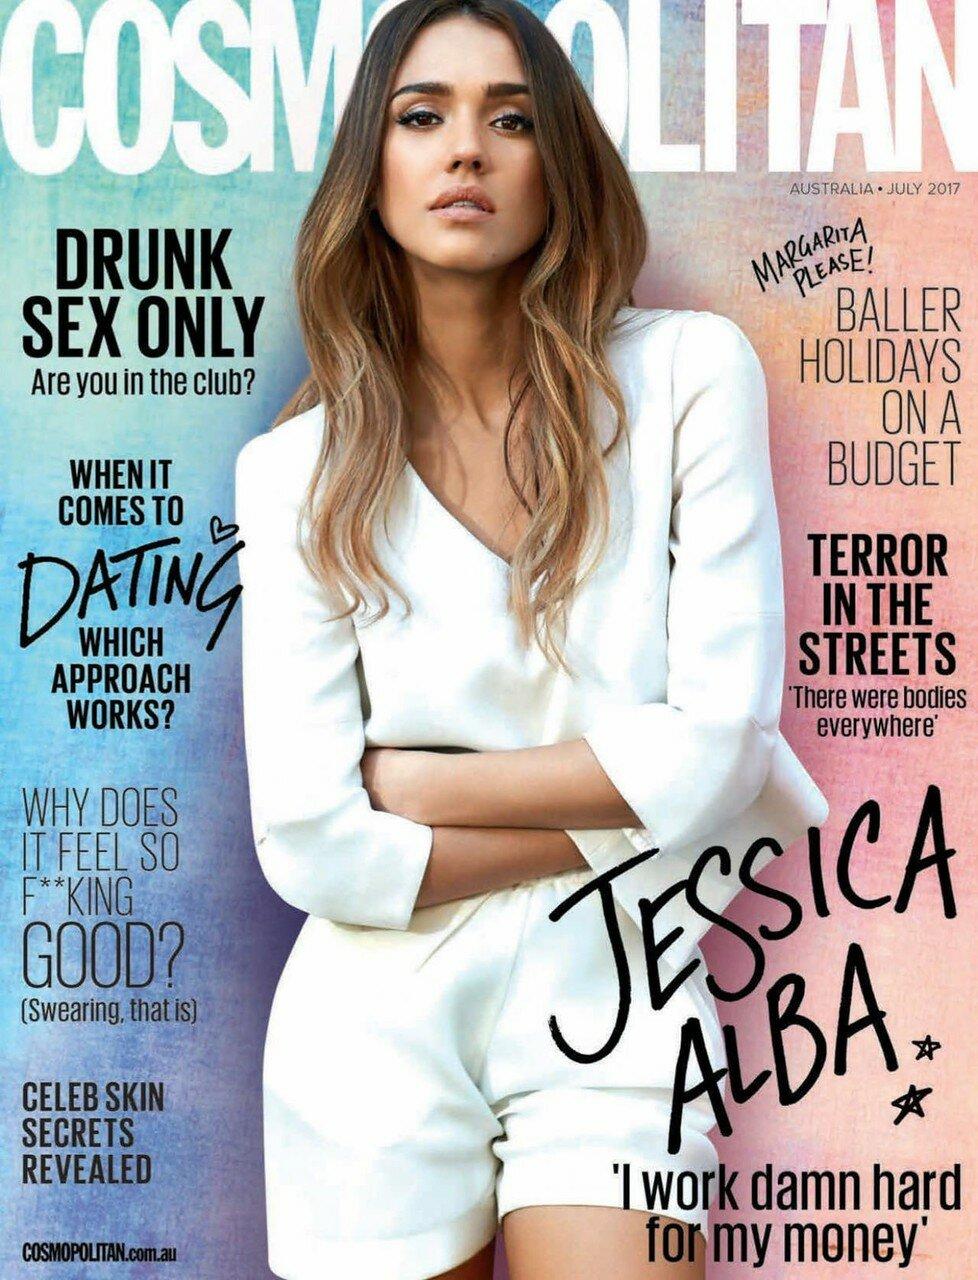 jessica-alba-cosmopolitan-australia-july-2017-issue-1.jpg